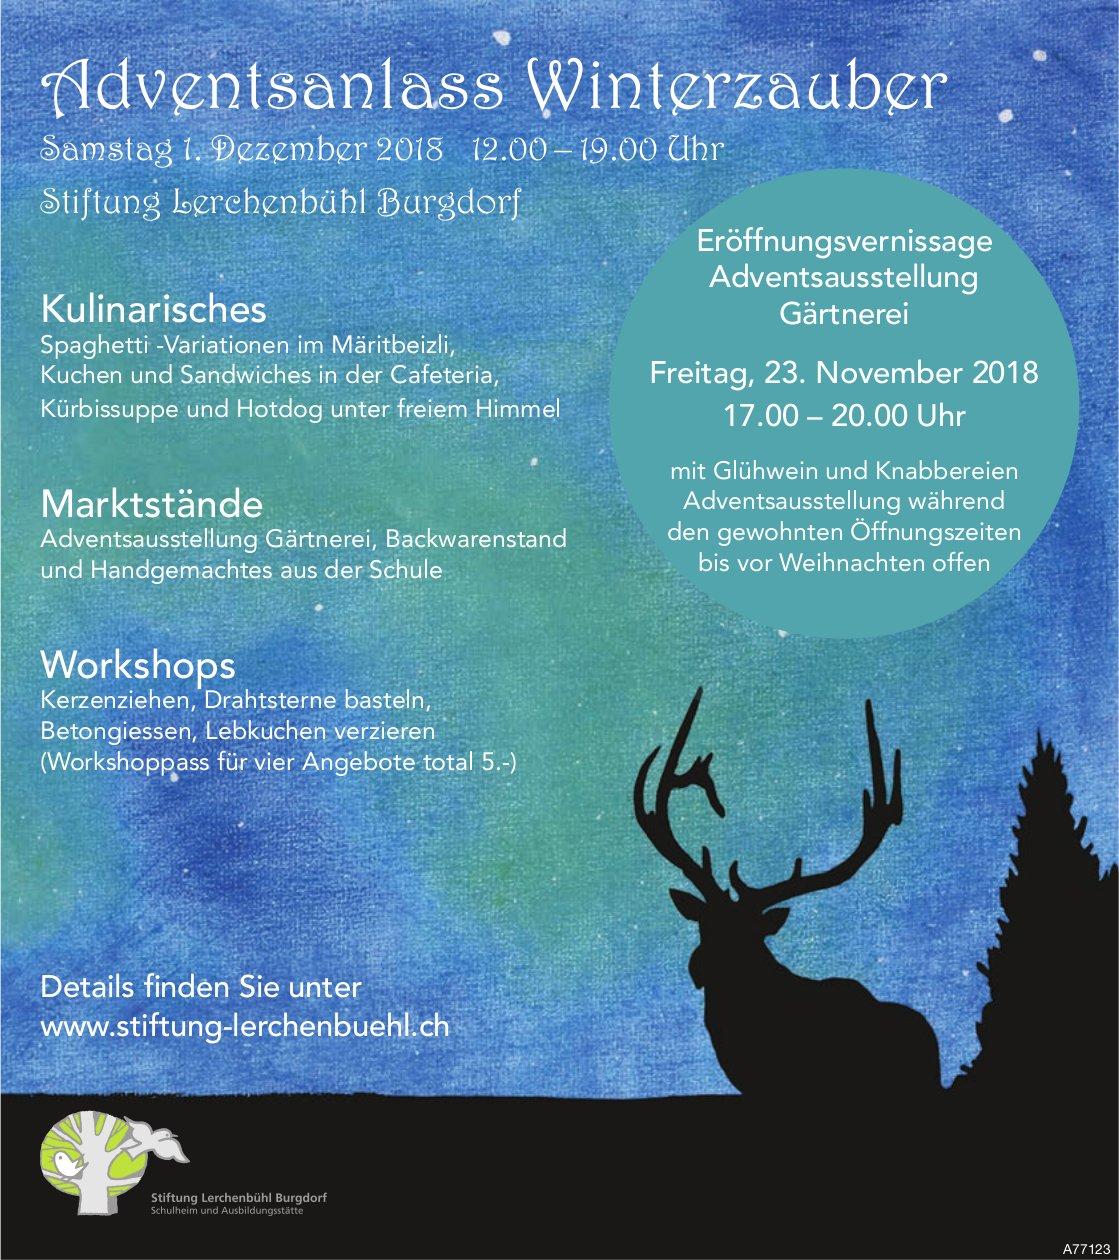 Adventsanlass Winterzauber, 1. Dez., Stiftung Lerchenbühl Burgdorf